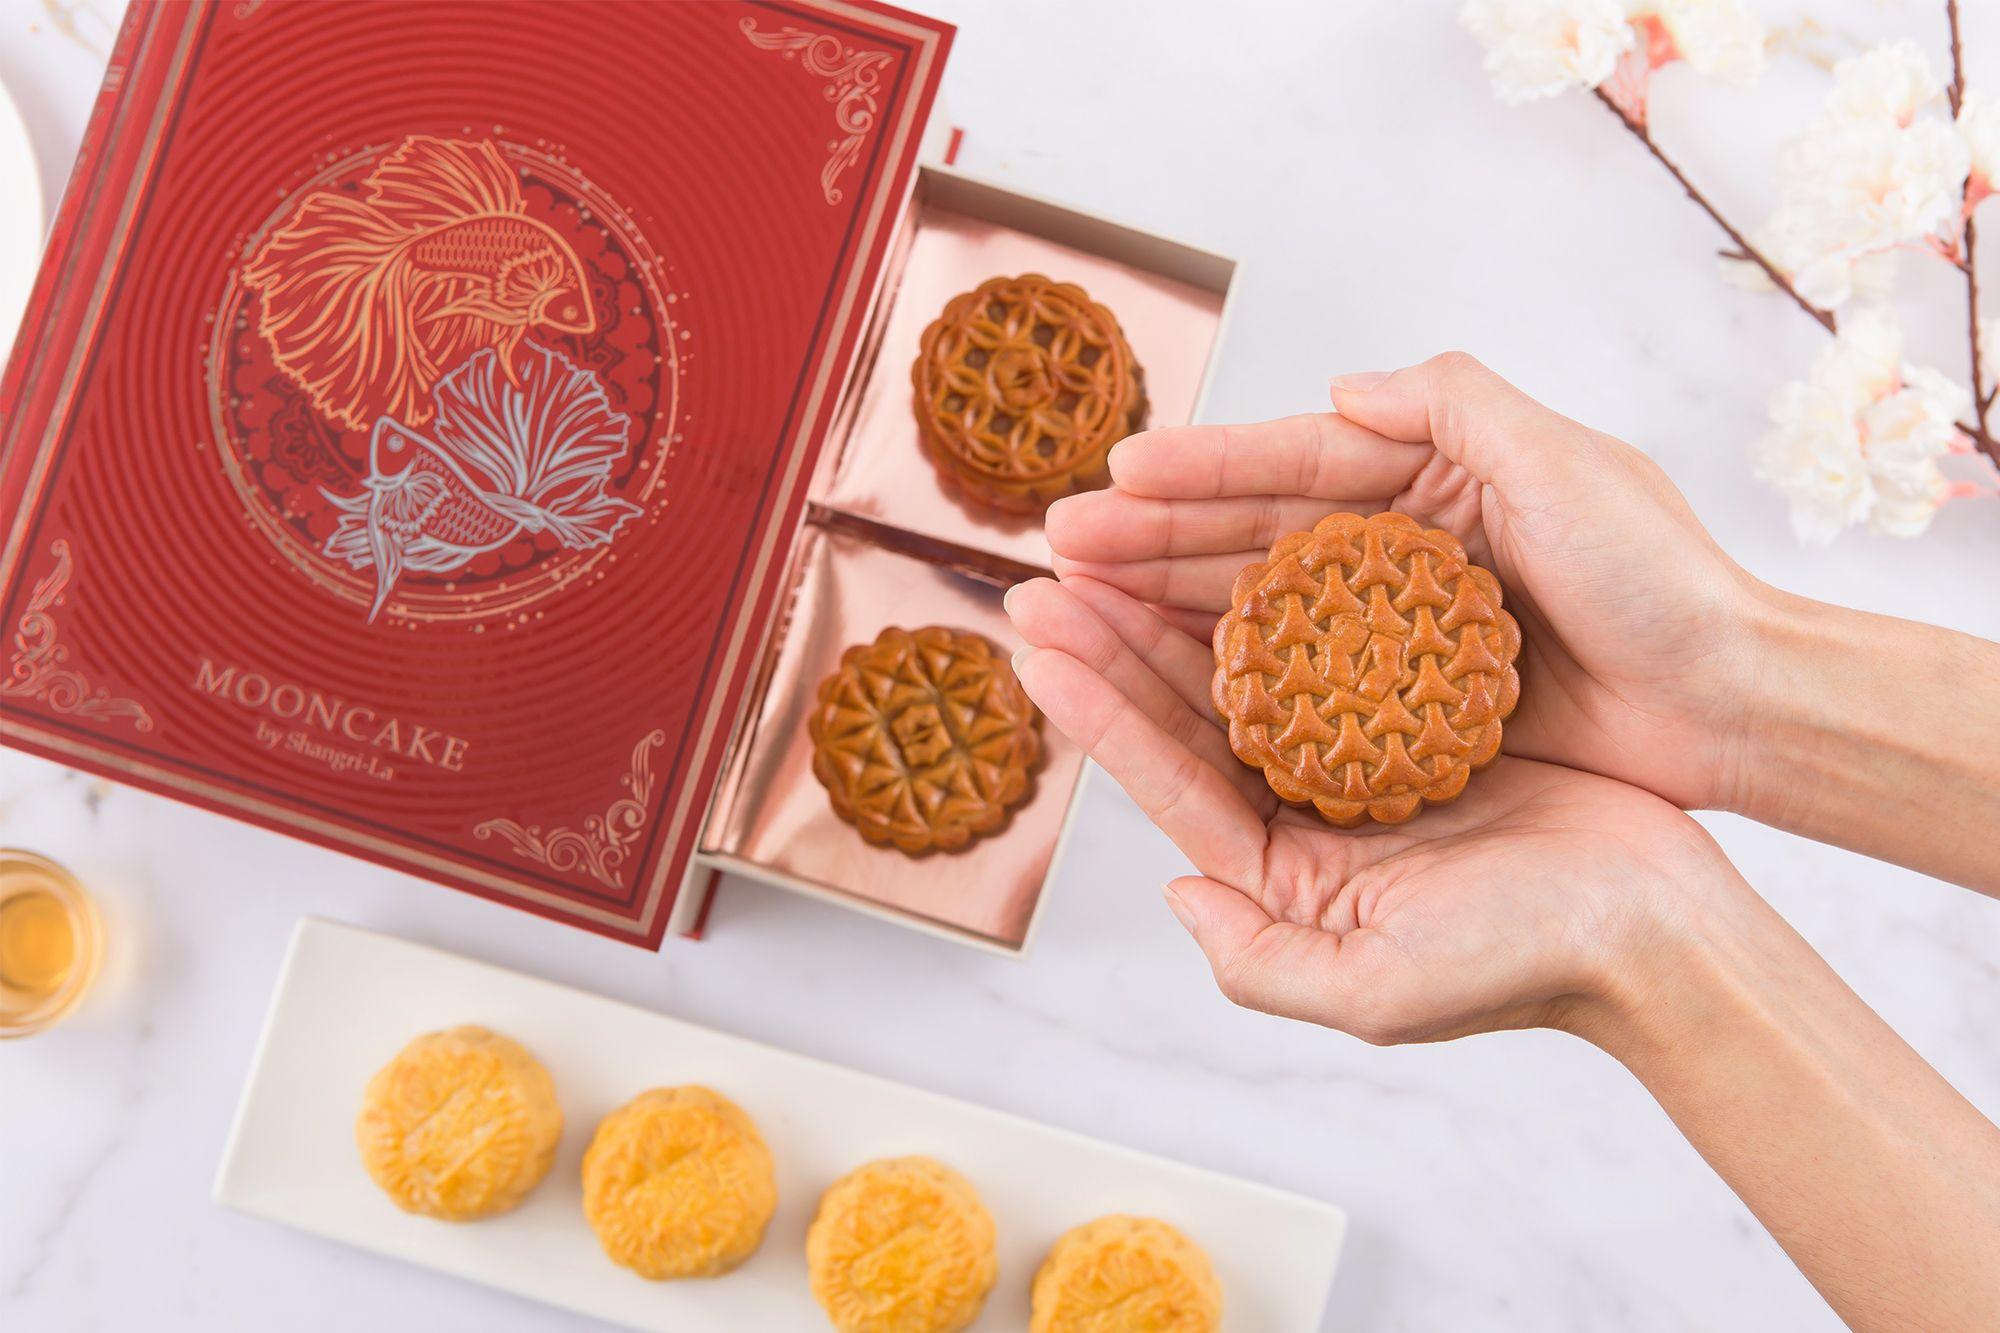 Moon Cake Festival 2020.Mooncakes To Pre Order For Mid Autumn Festival 2019